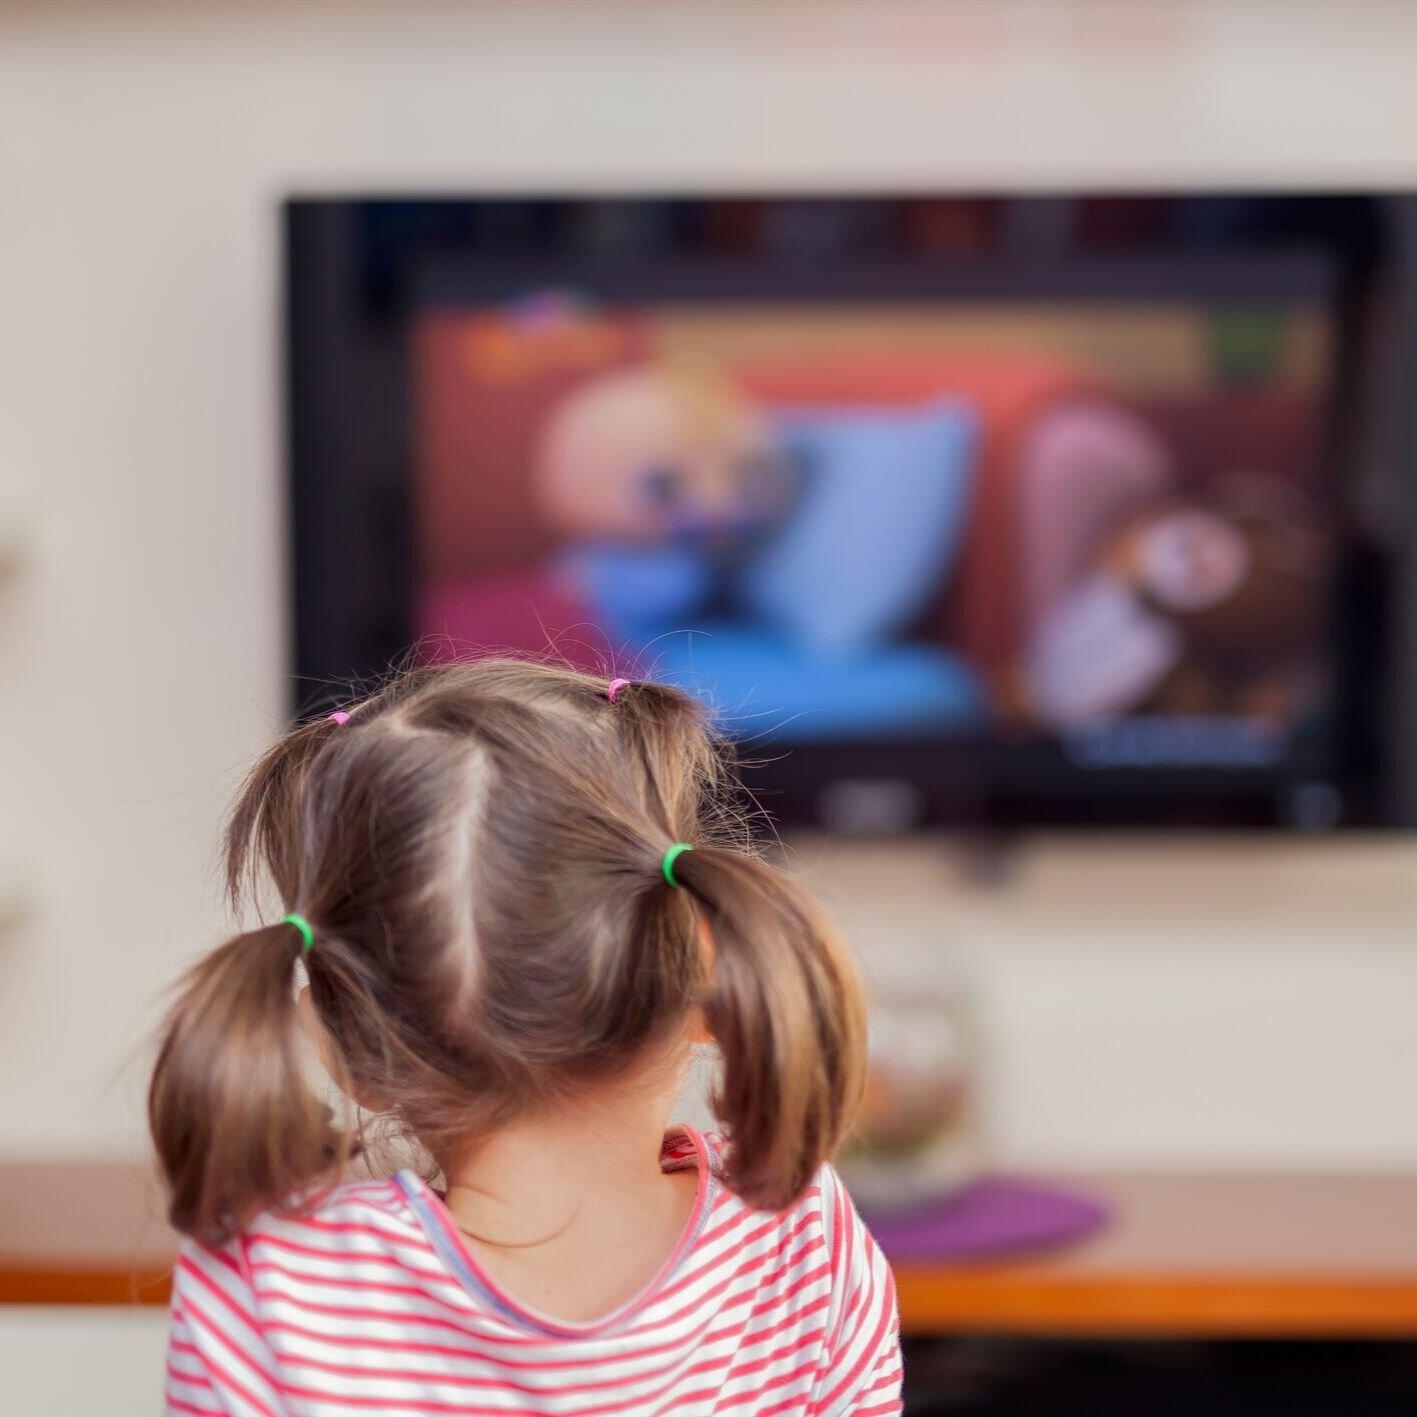 Girl Watching TV.jpg